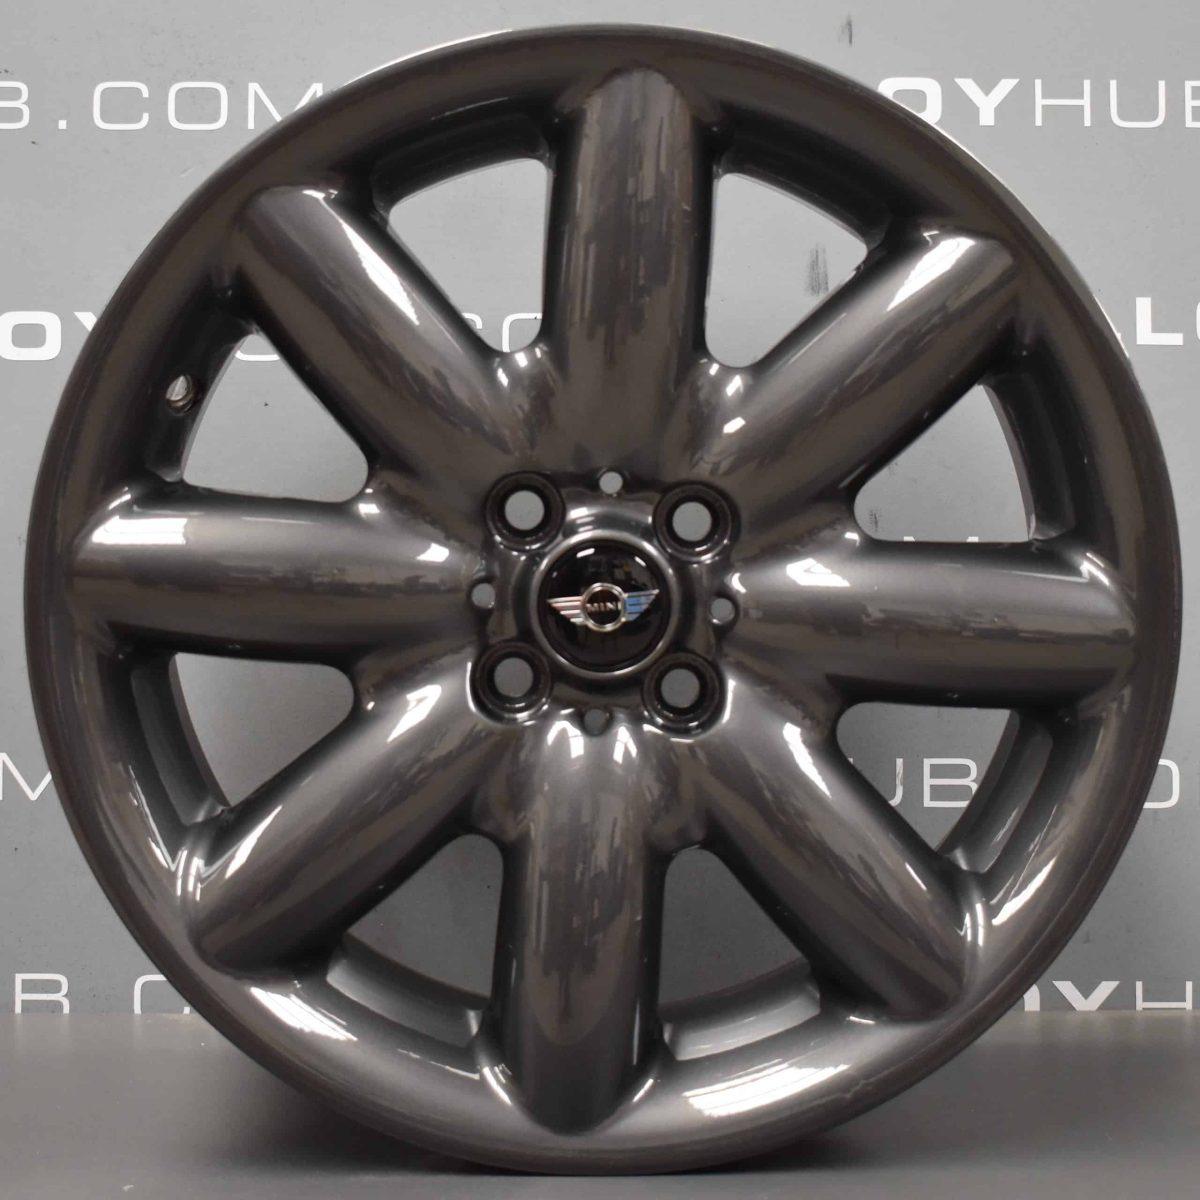 "Genuine Mini Cooper S R50 R53 R56 R85 S Spoke 17"" inch Alloy Wheels with Anthracite Grey Finish 36111512352"